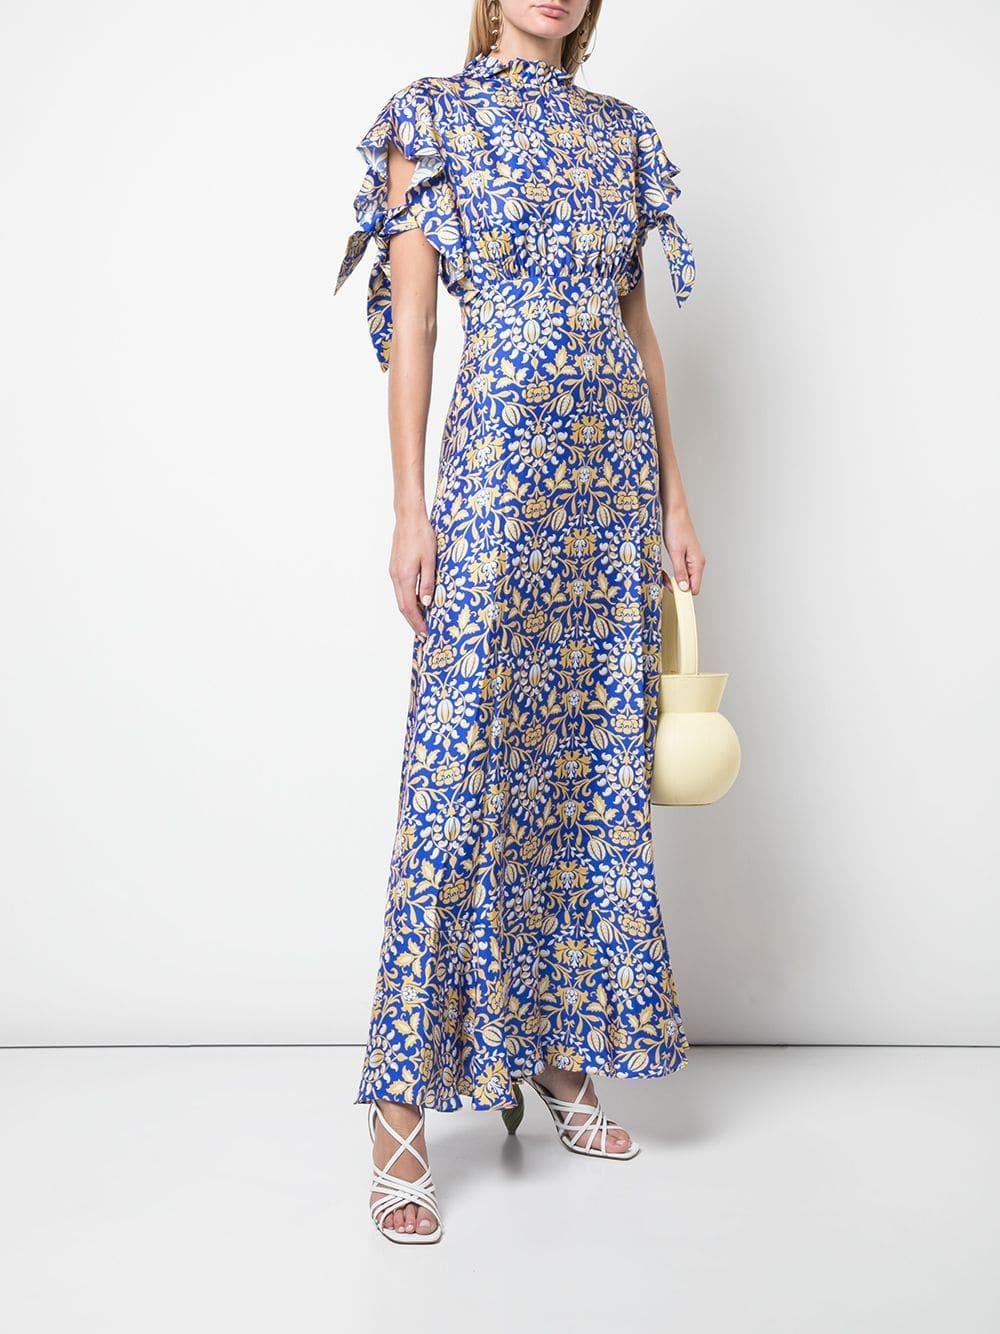 932c12e5c0dce5 Cynthia Rowley Talia Flutter Sleeve Dress in Blue - Lyst